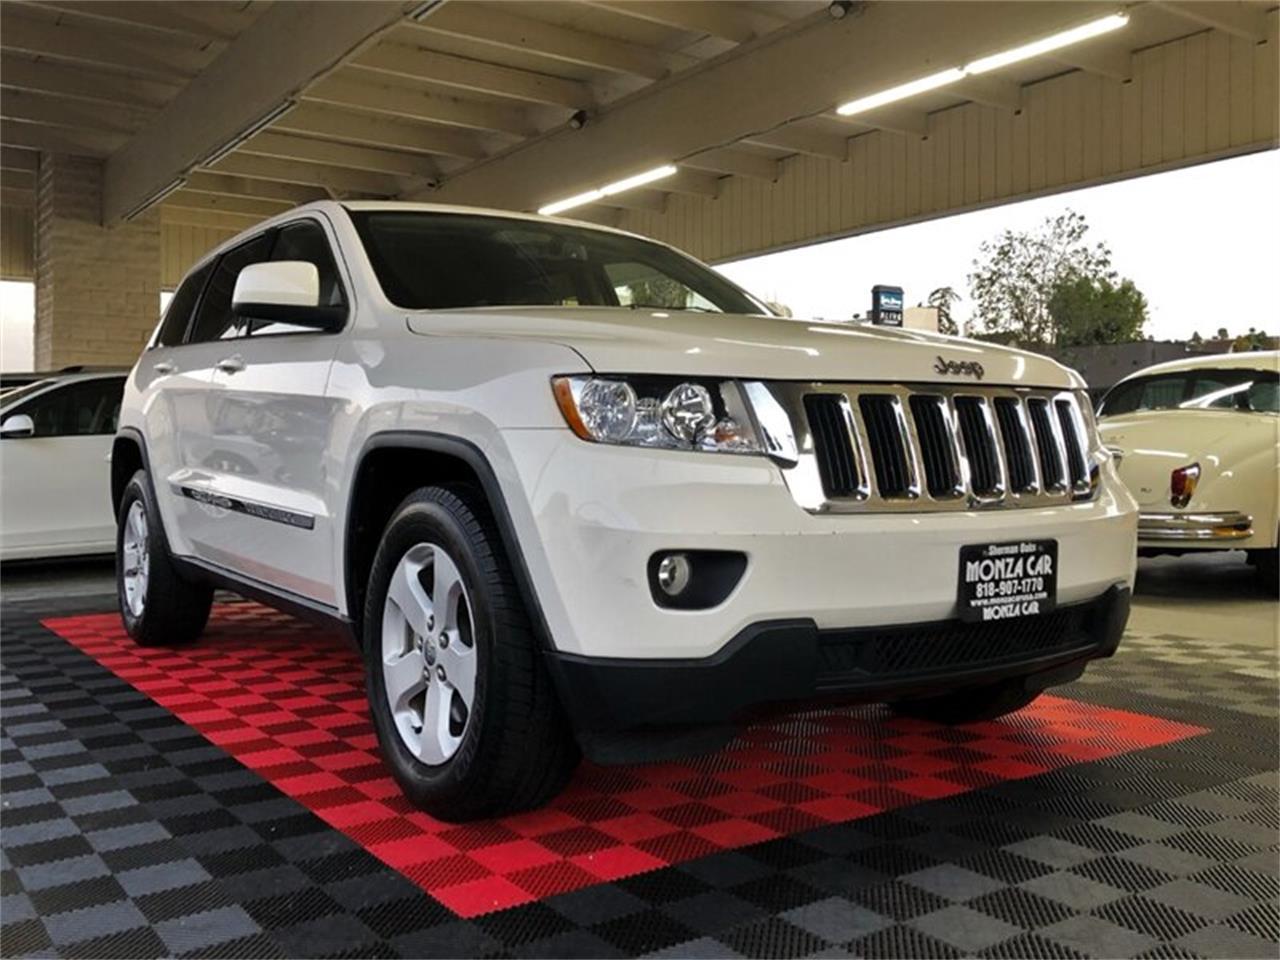 2011 Jeep Grand Cherokee (CC-1296170) for sale in Sherman Oaks, California